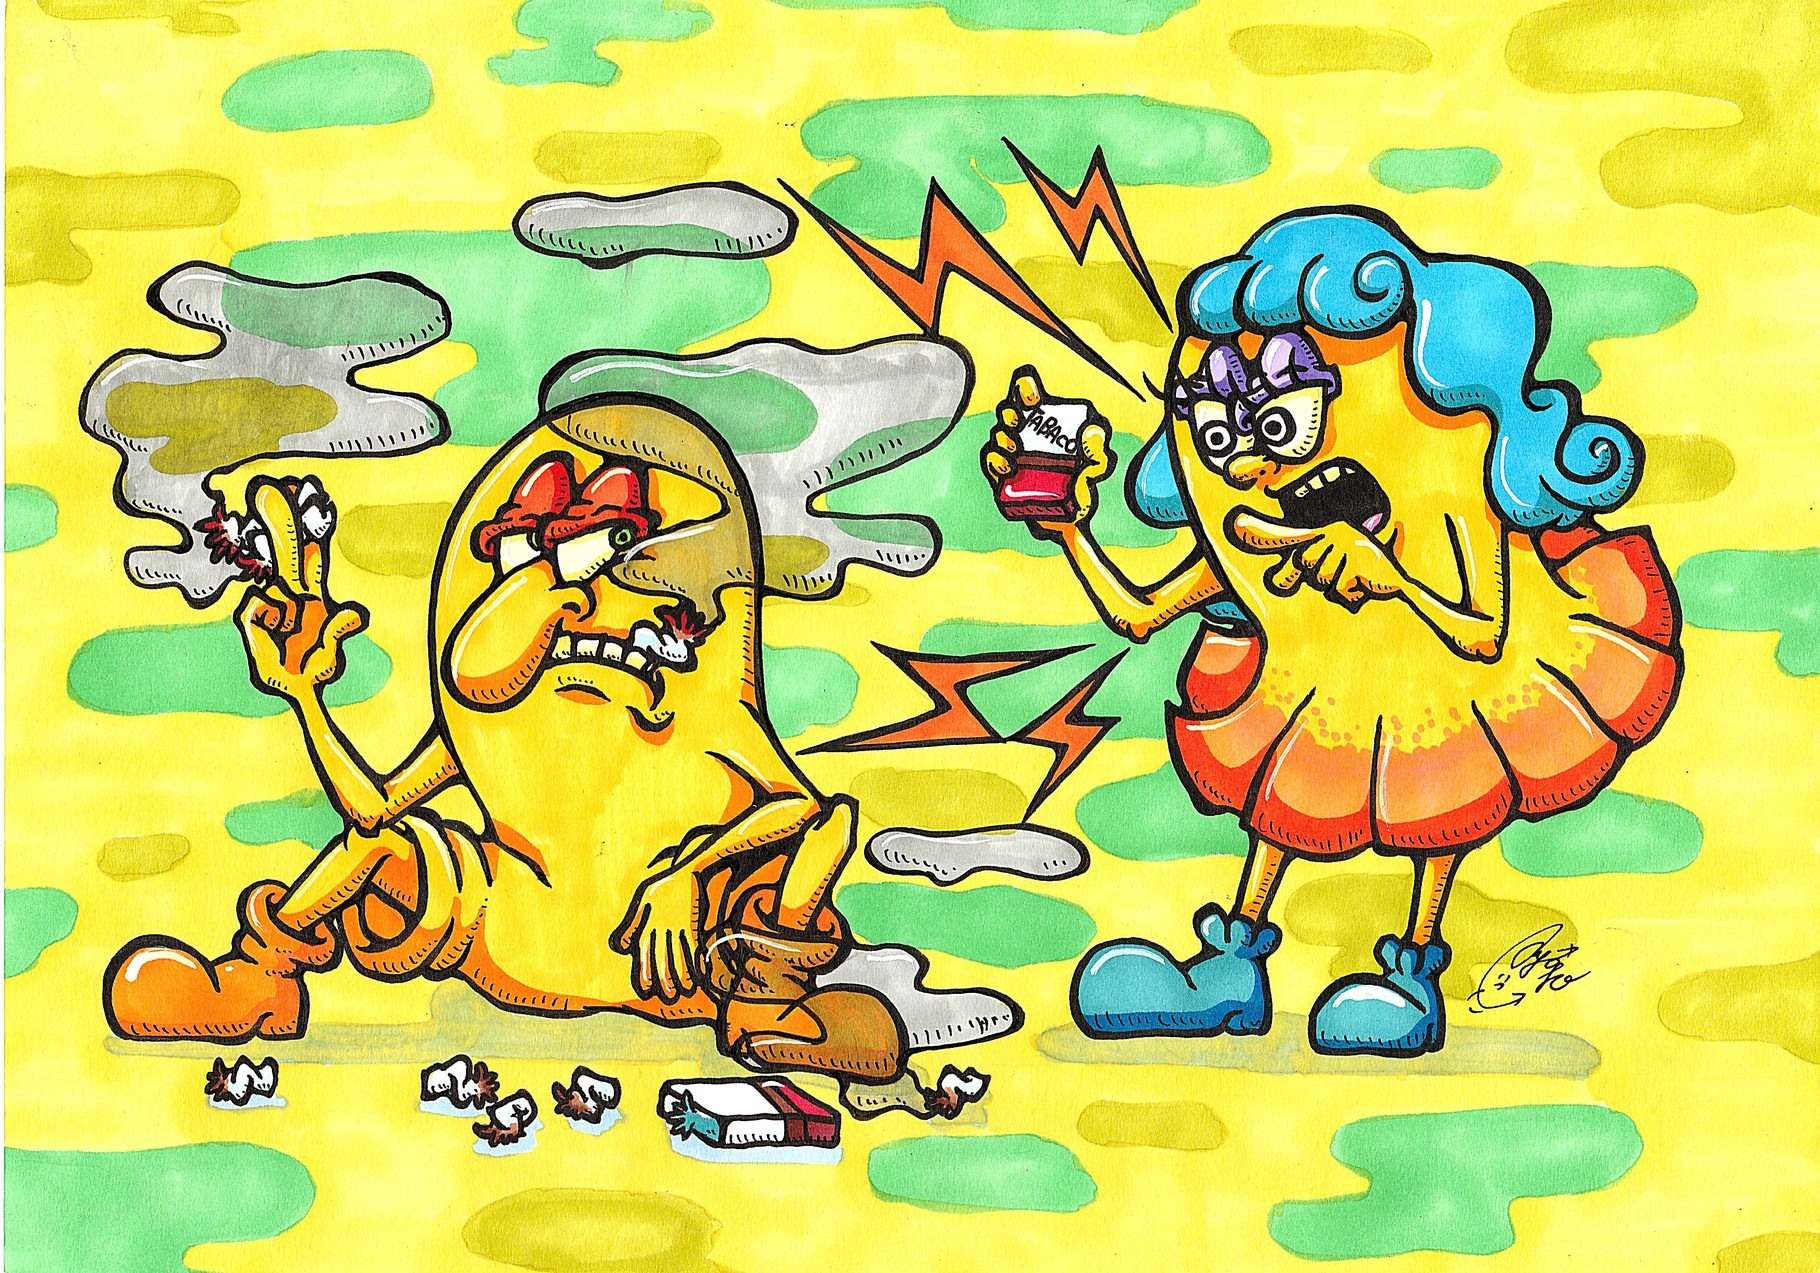 YELLOW JUNKIE「タバコは体に悪いんだから」